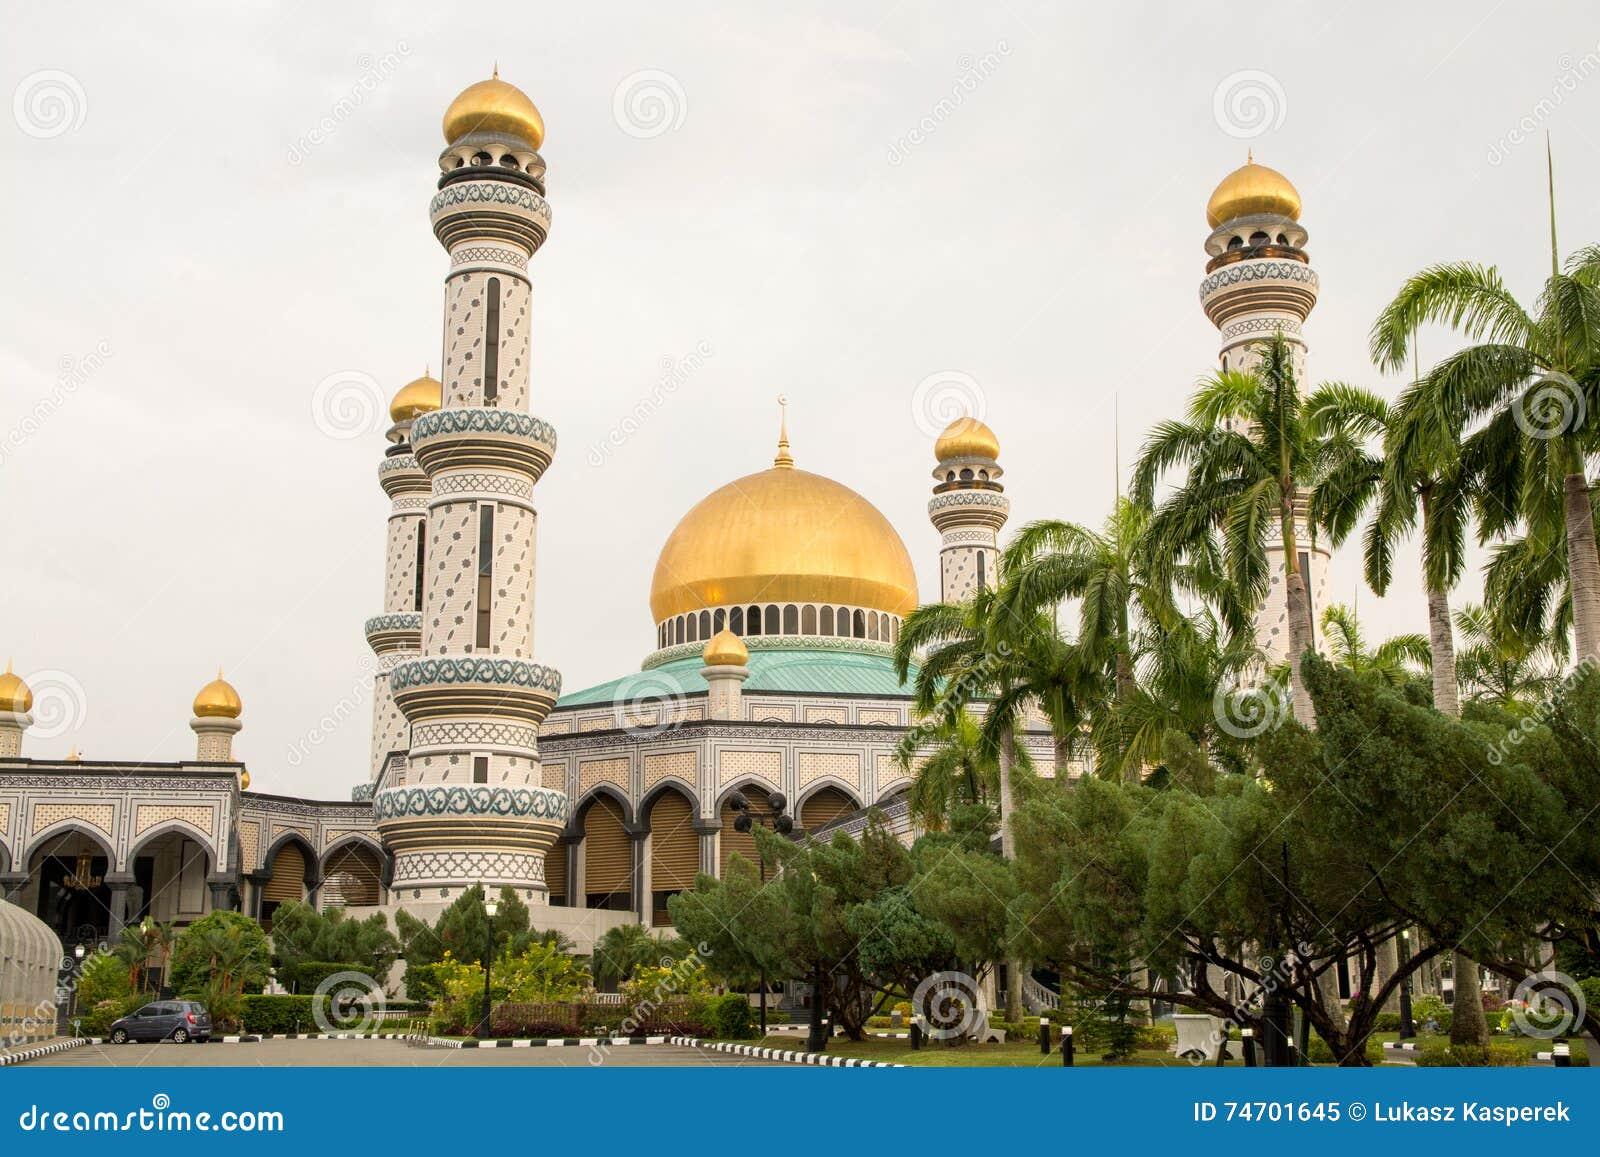 Brunei darussalam dating